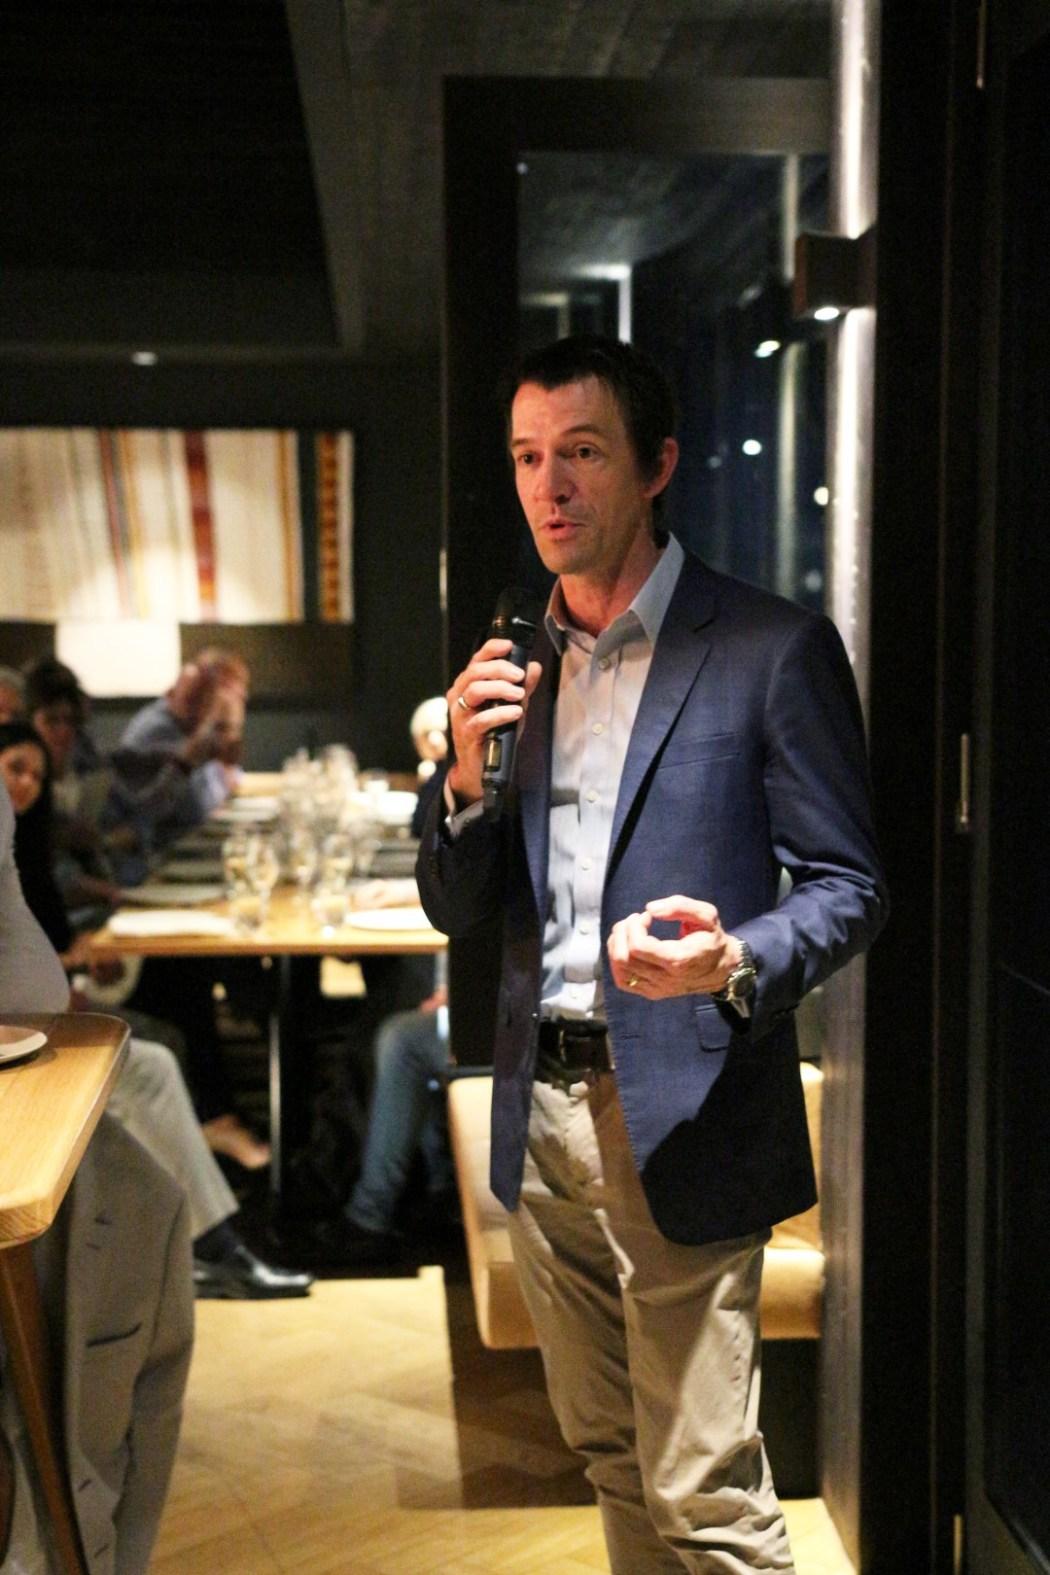 Notable wine writer Tyson Stelzer presenting 2KW's Pol Roger dinner.